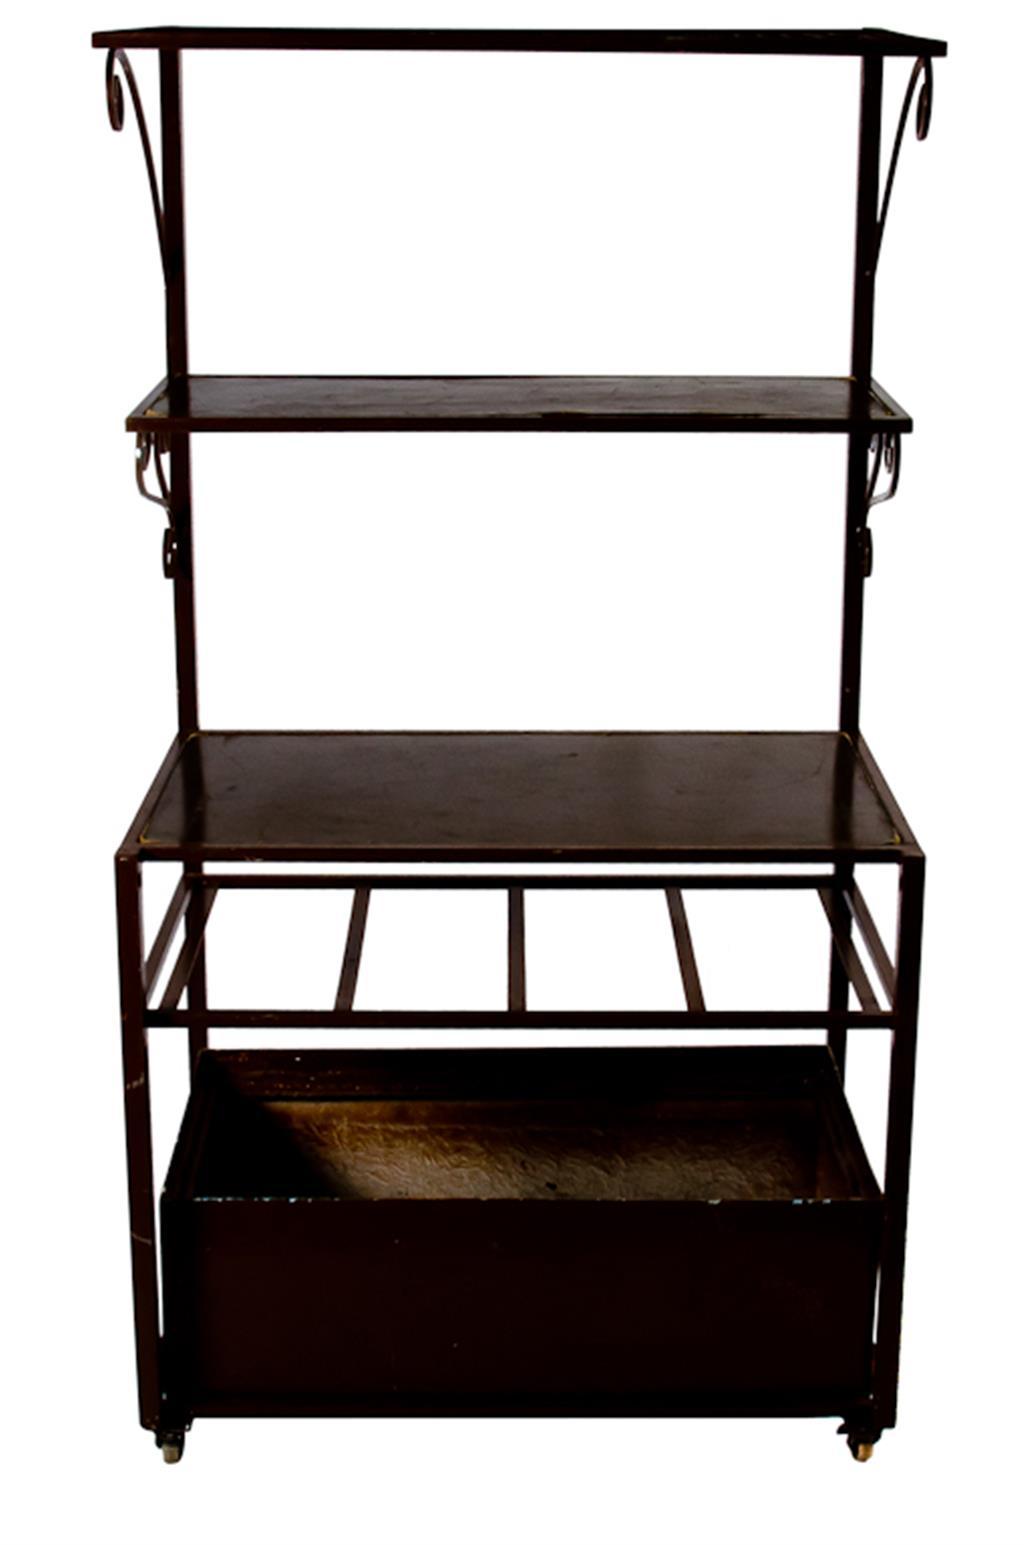 Bar de ferro Marrom - 0245